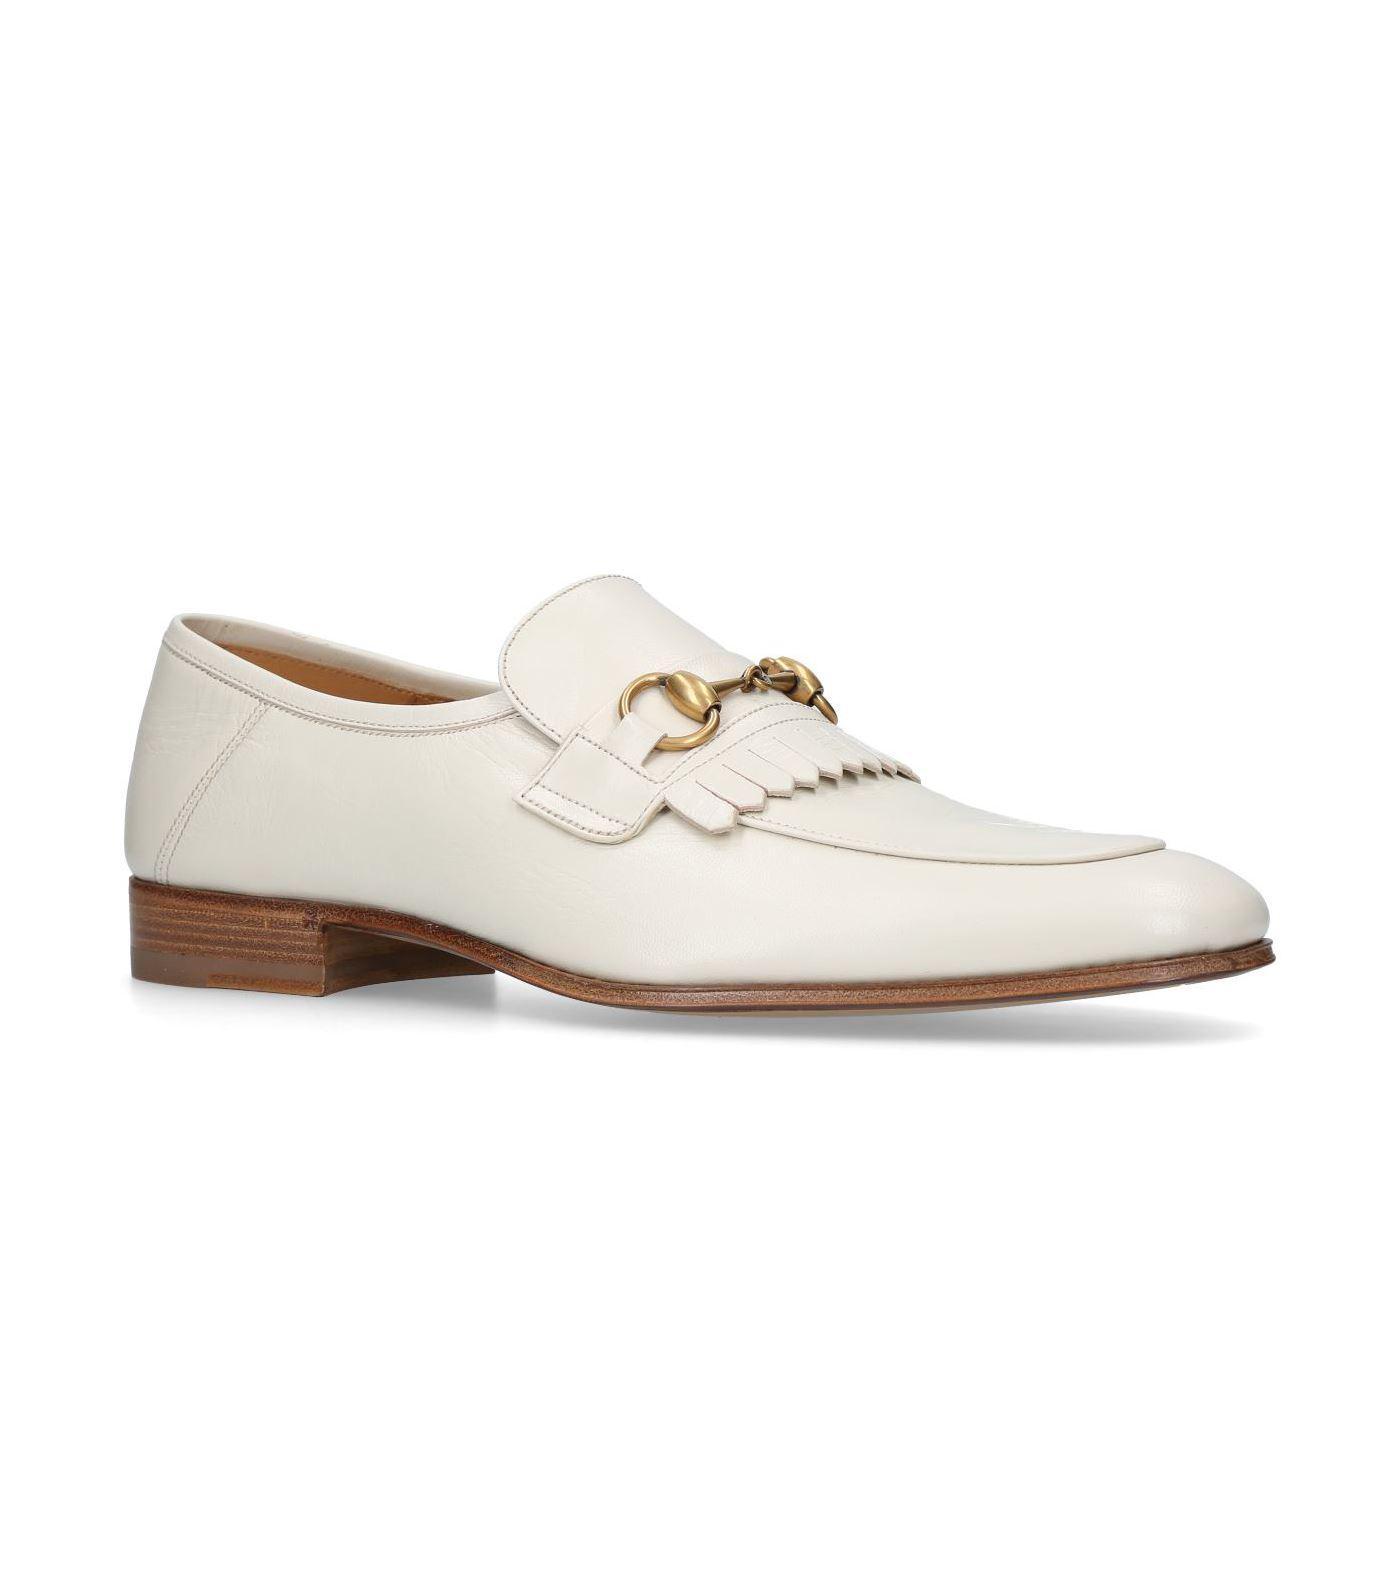 lyysmAgNHR Ivory Harbor Dress Loafers 51df1